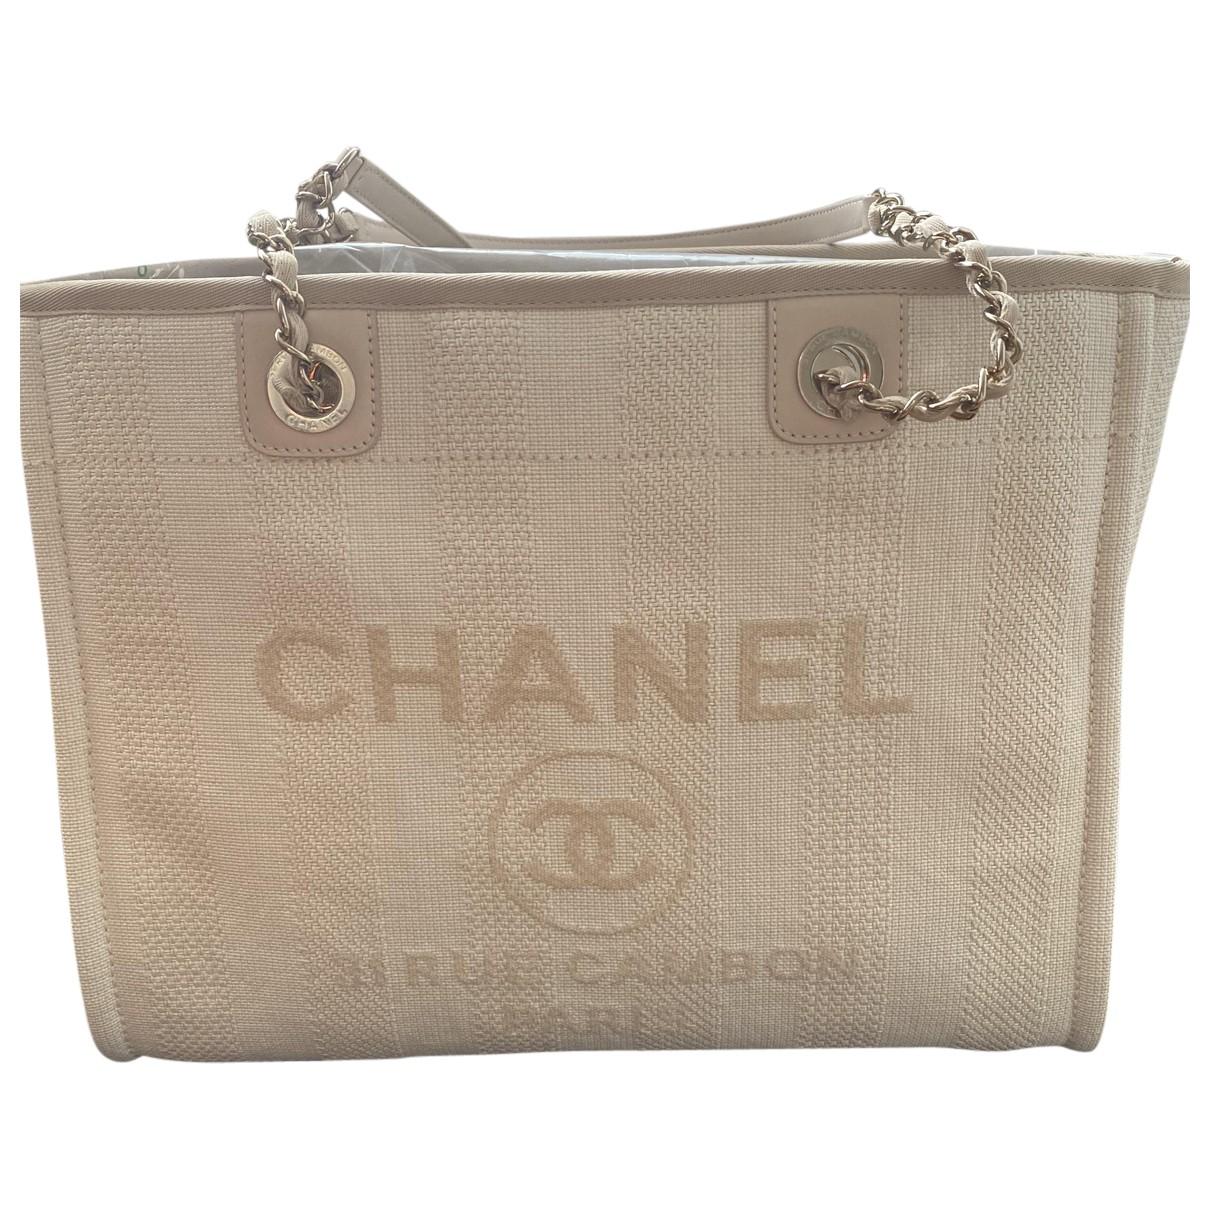 Chanel Deauville Ecru Cotton handbag for Women N